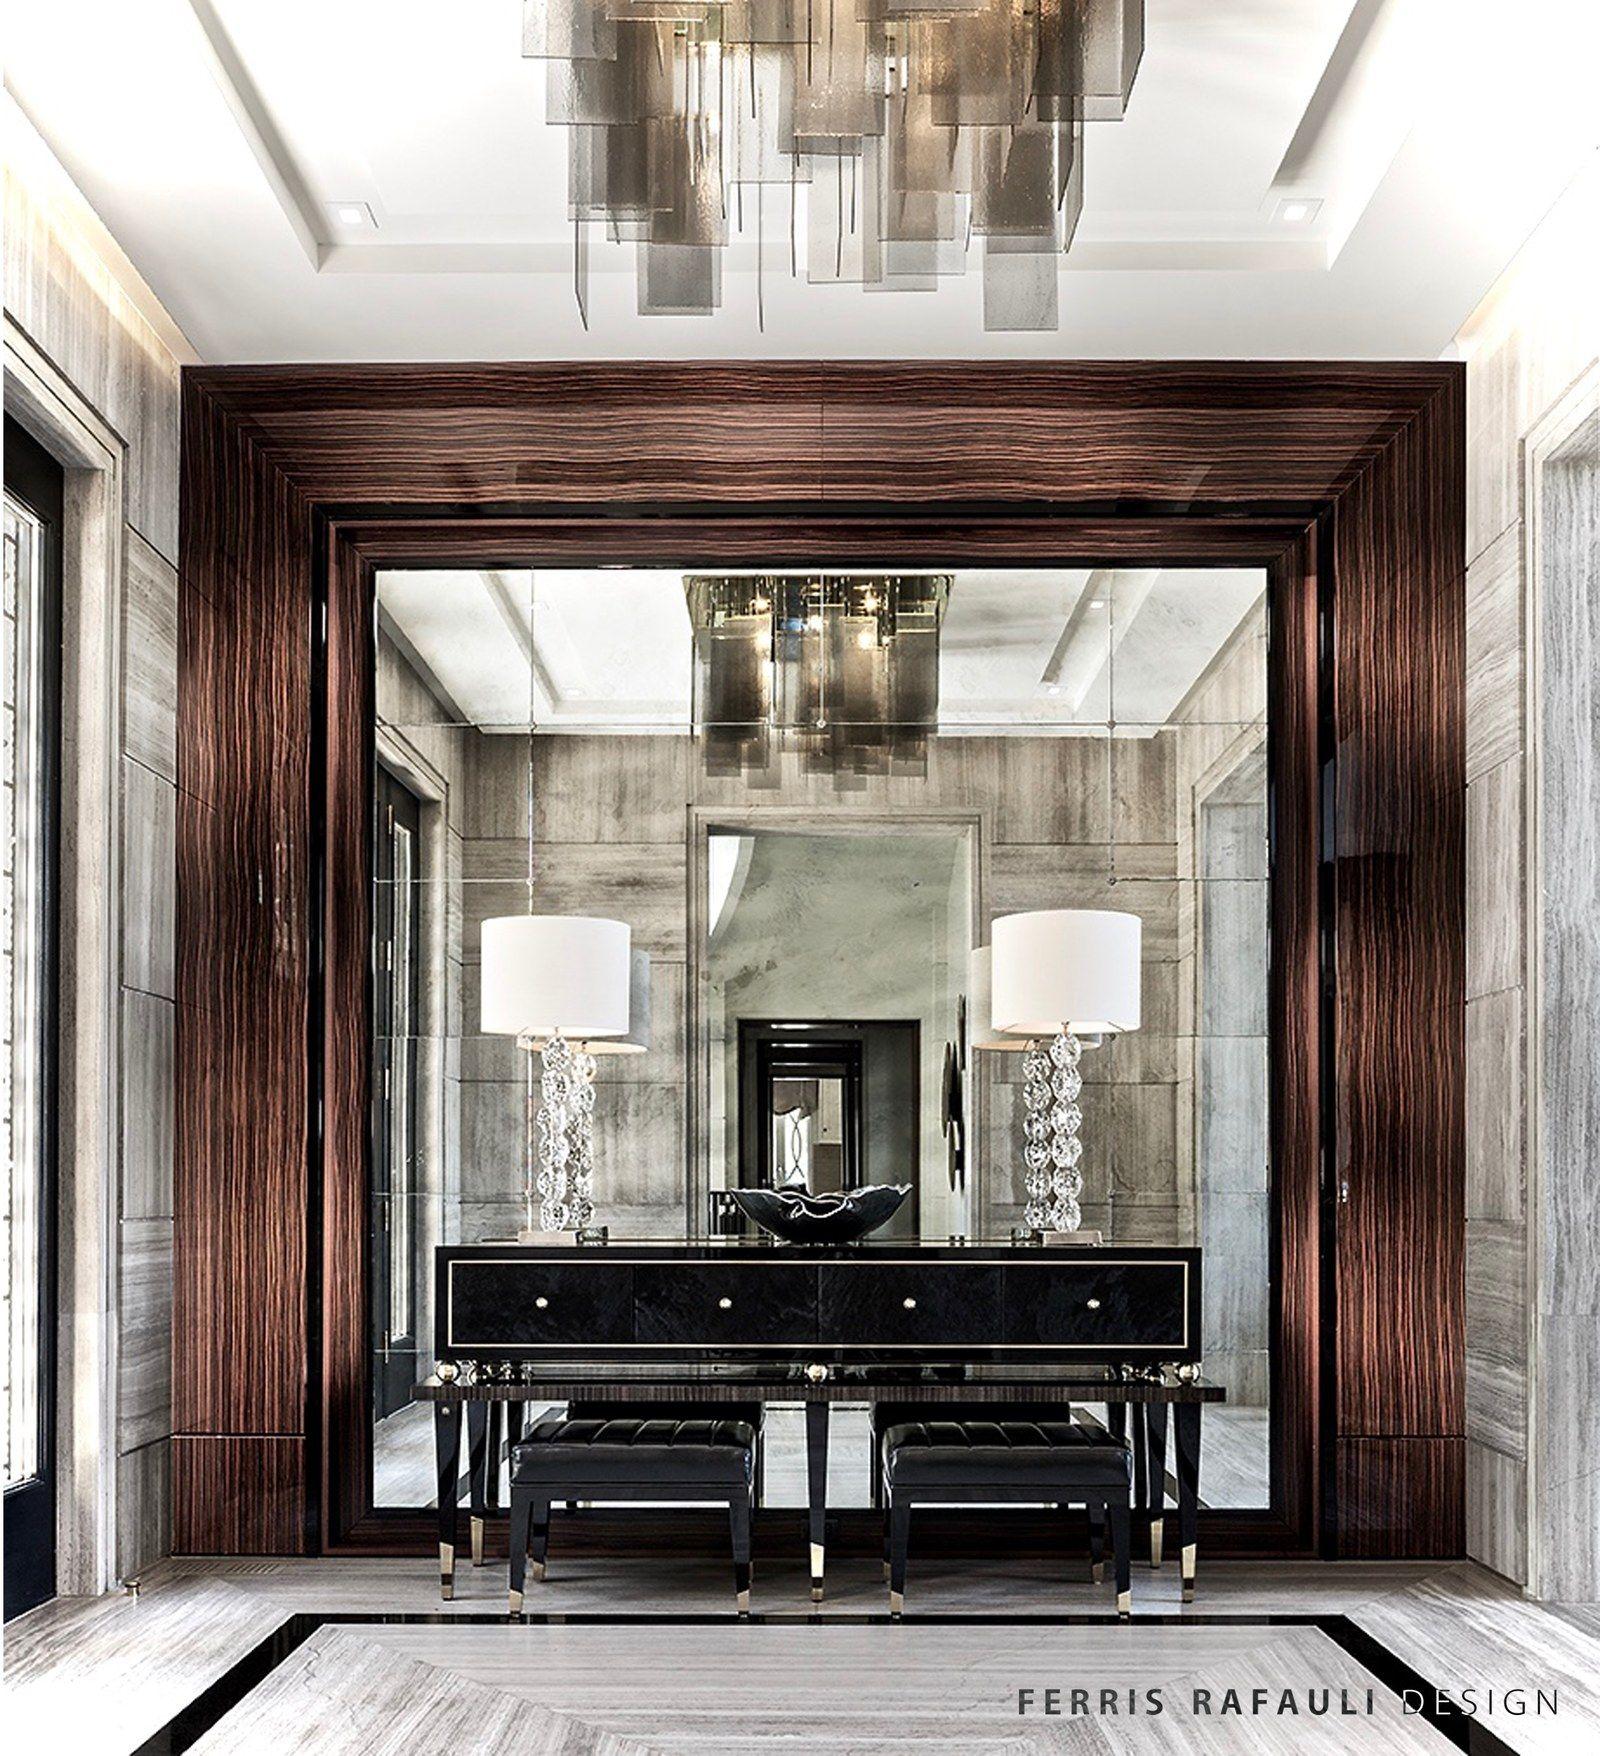 Luxury Home Interiors Bathroom: Architecture By Ferris Rafauli